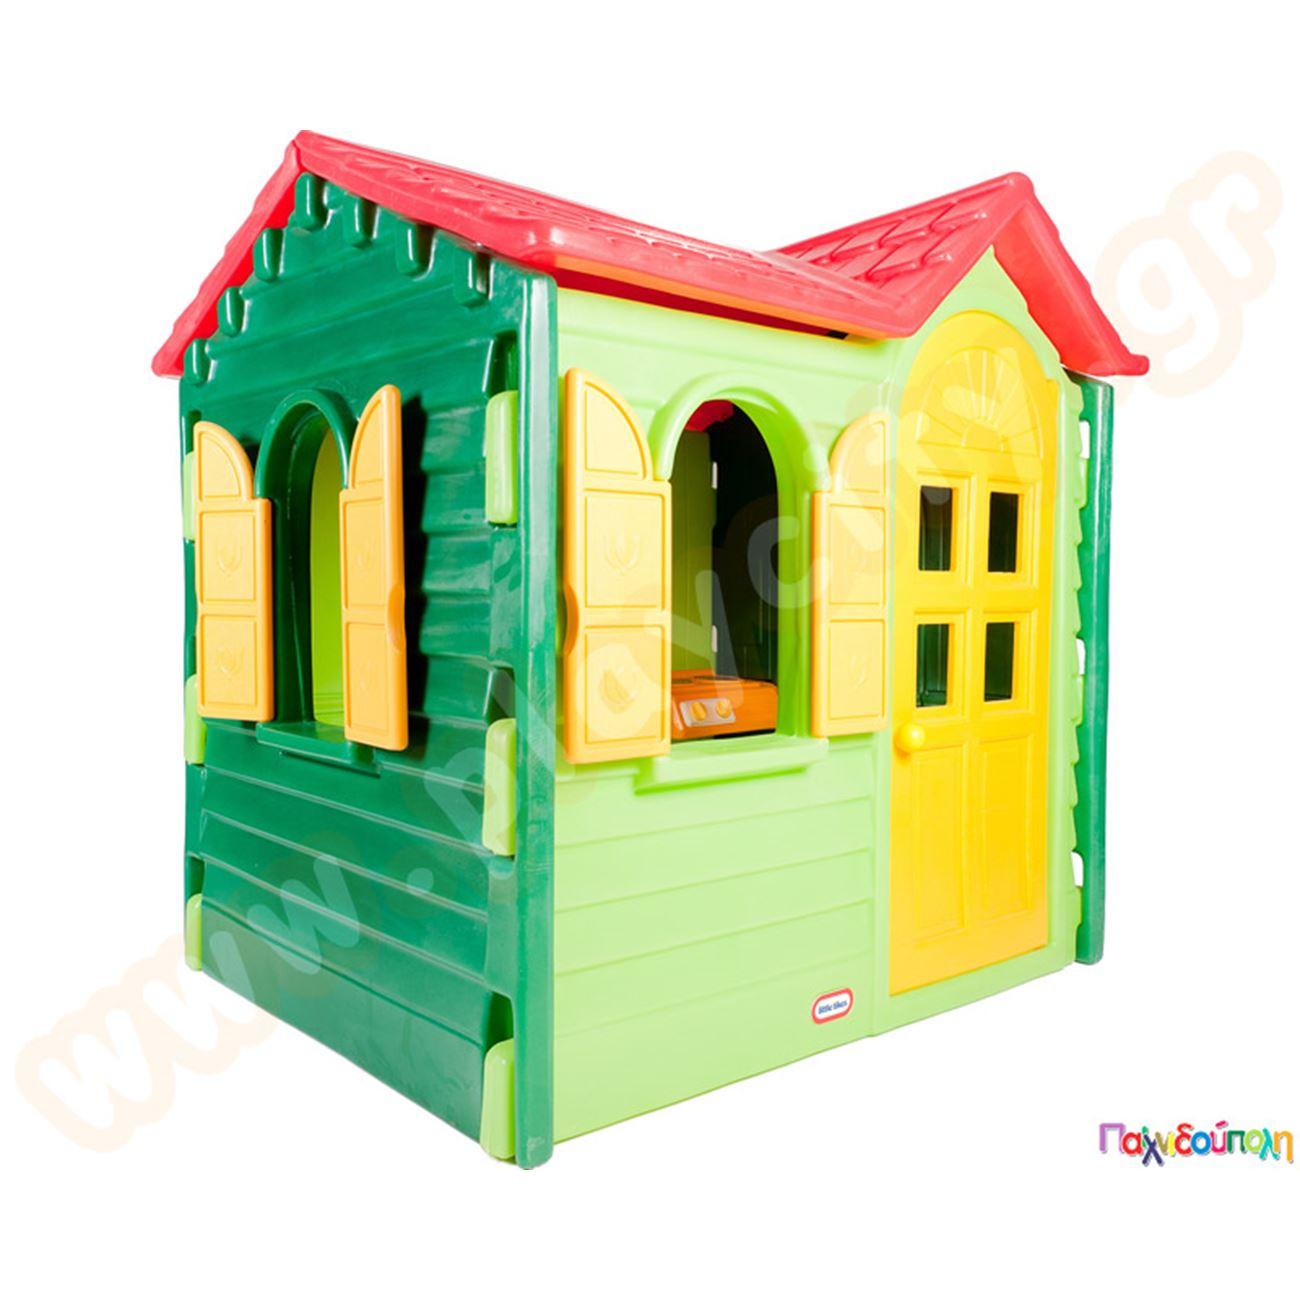 a3729793f43c Παιχνίδια Εξωτερικού Χώρου και Μίμησης Little Tikes Πλαστικό παιδικό ...